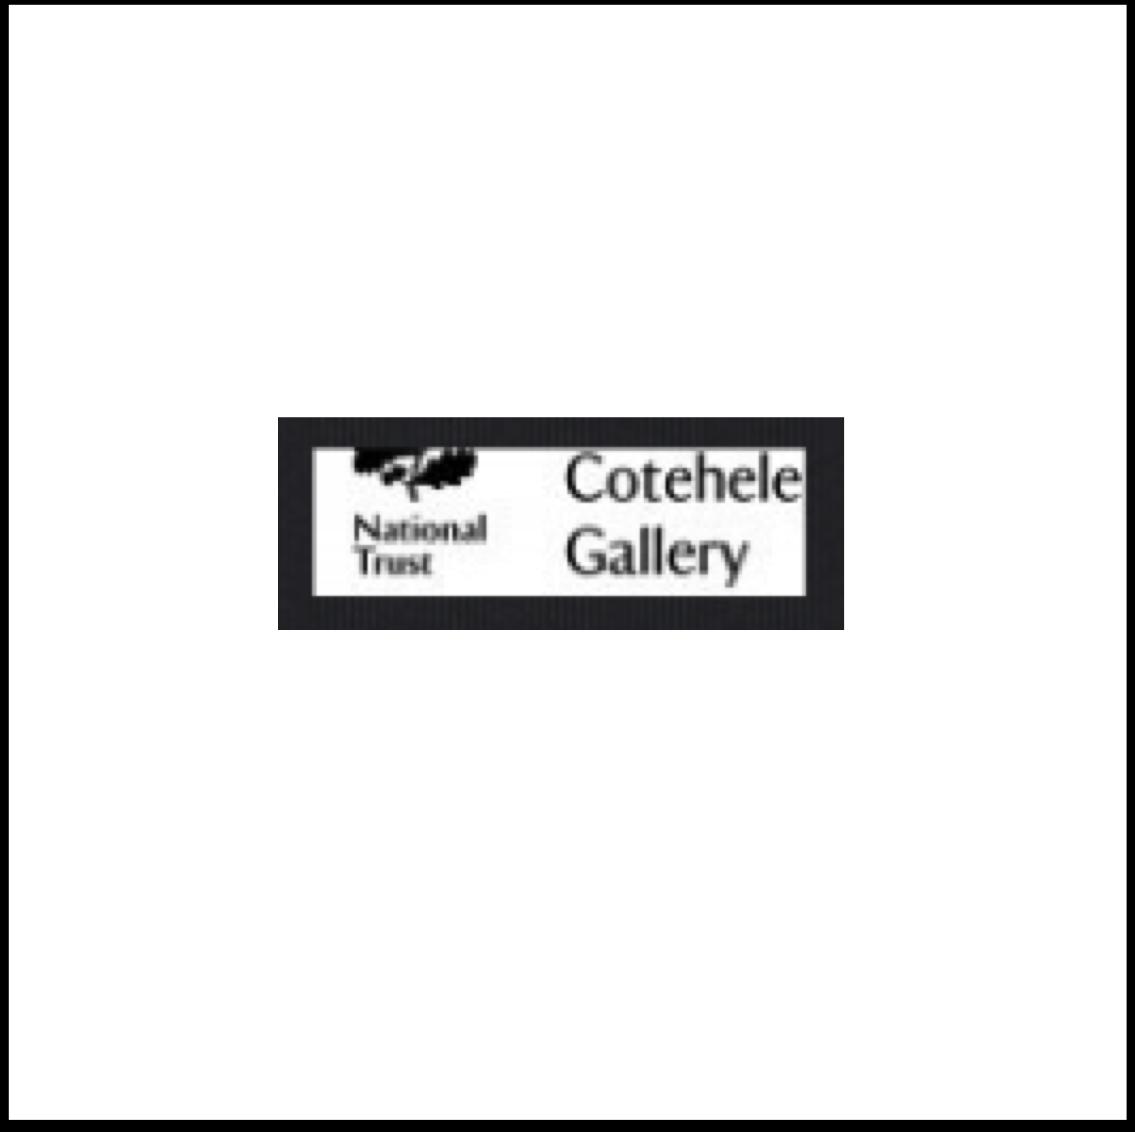 Cotehele Gallery, National Trust,  Saltash, Cornwall